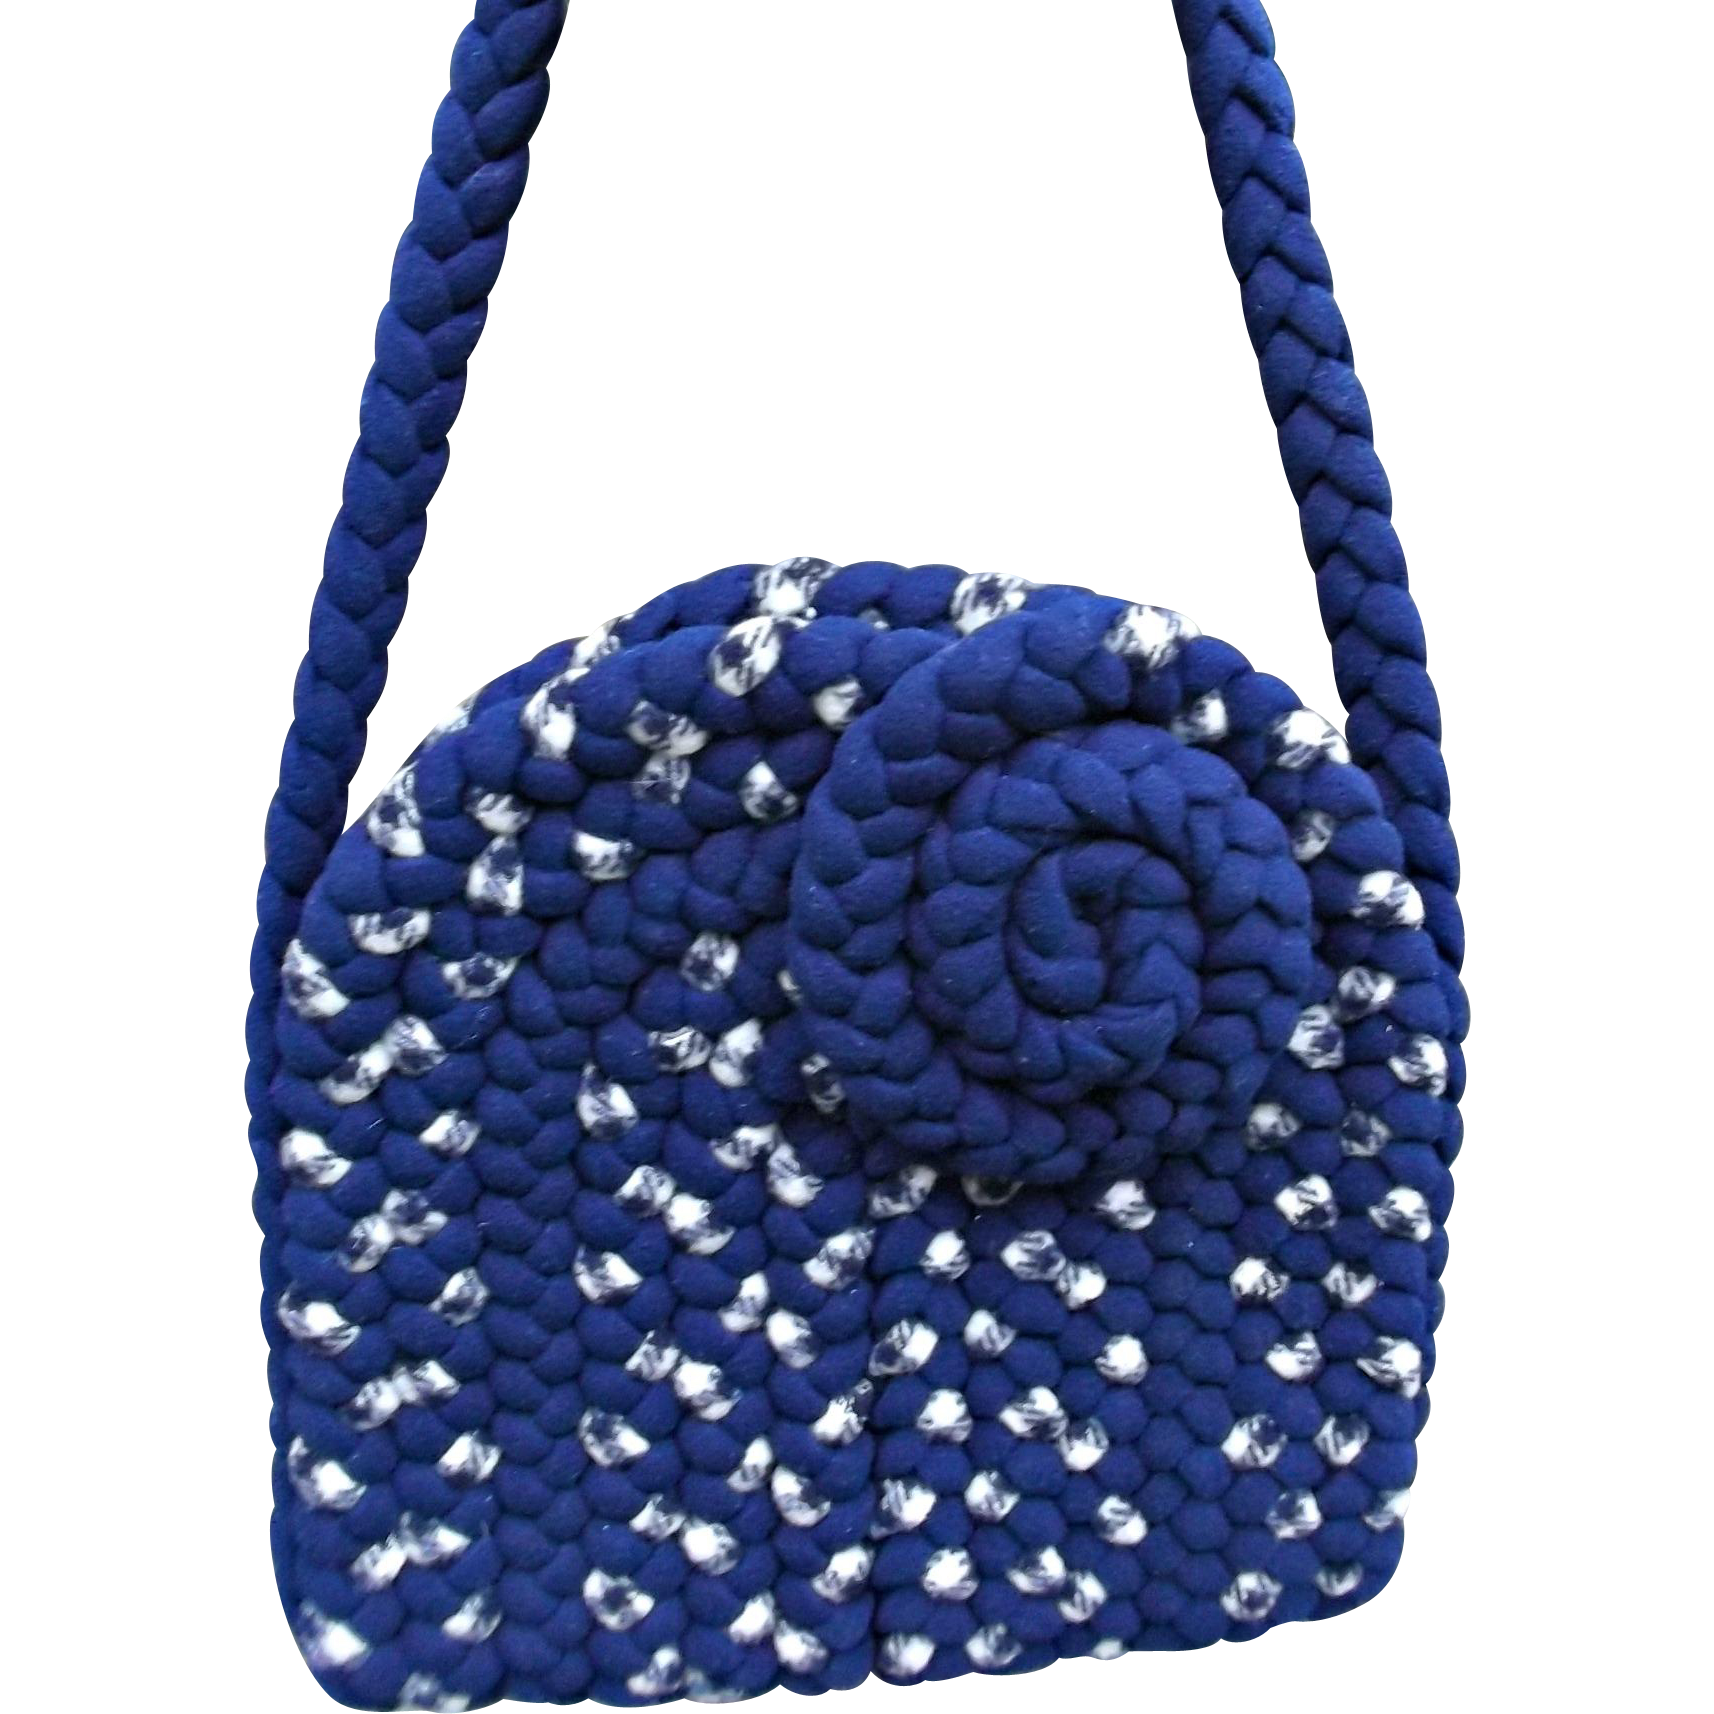 Vintage Braided Rug Bag Purse Handmade